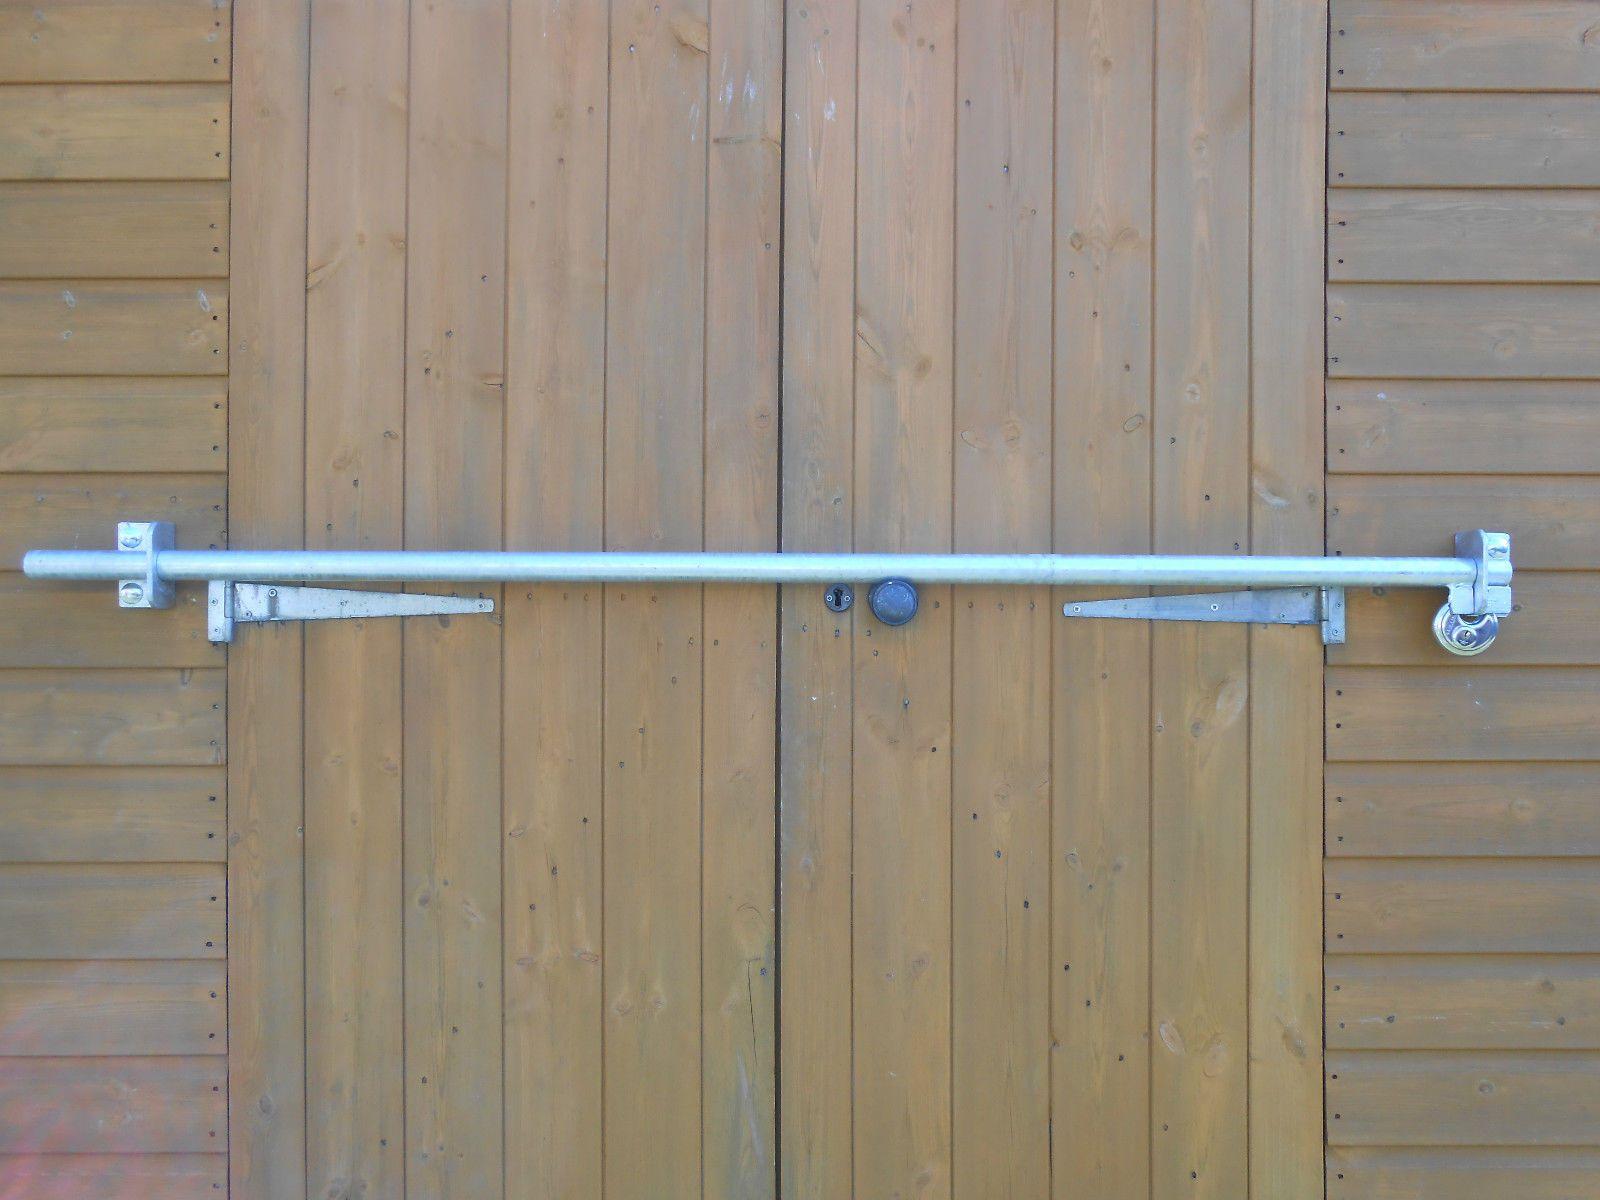 Shed Door Security Bar Heavy Duty Diy Galvanised 1100mm Free Stainless Lock Ebay Security Door Shed Doors Diy Home Security